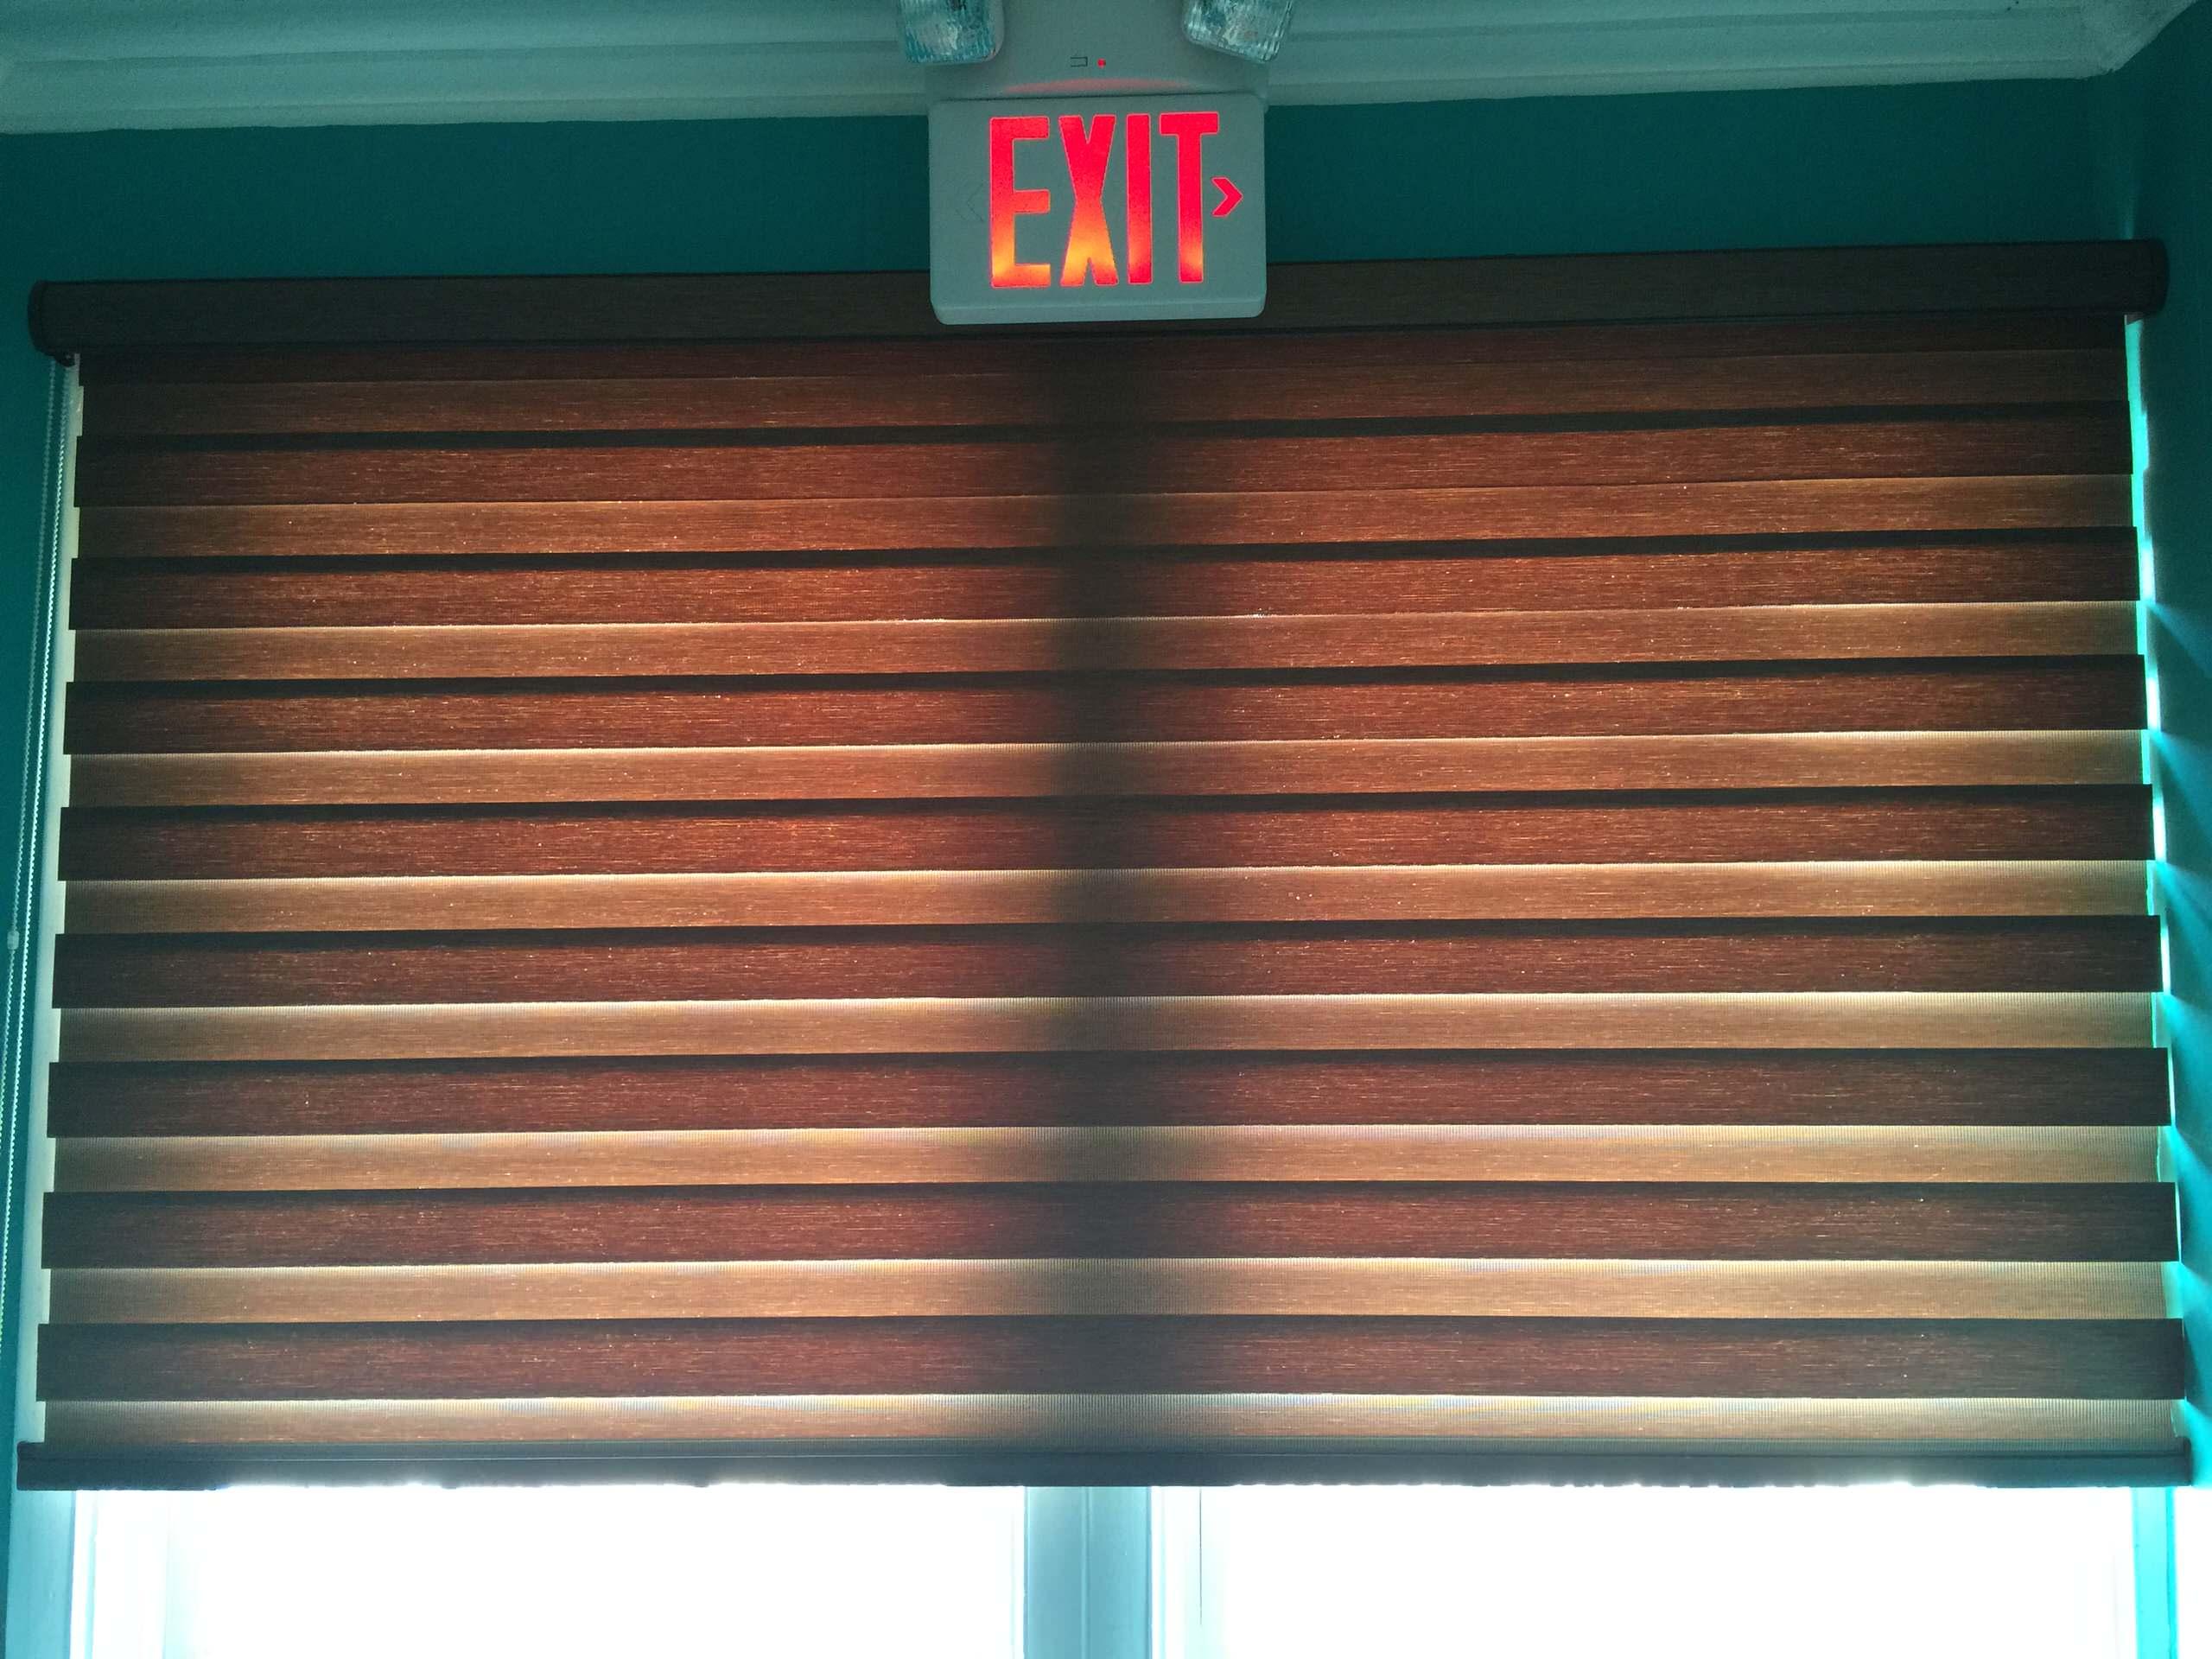 Allure window Treatments